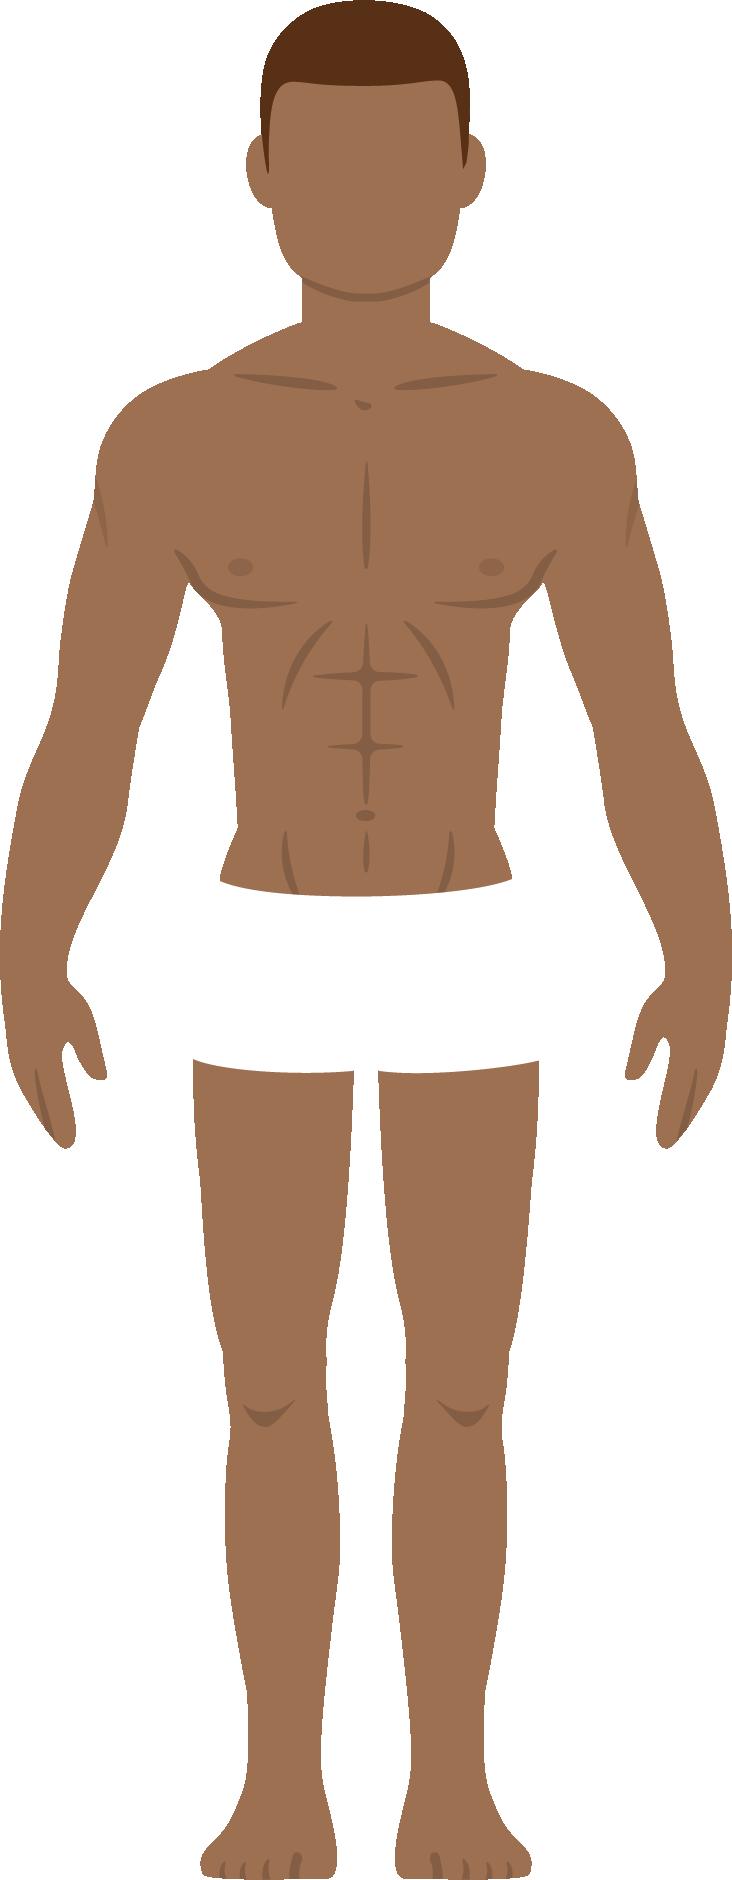 Stylised image of a man